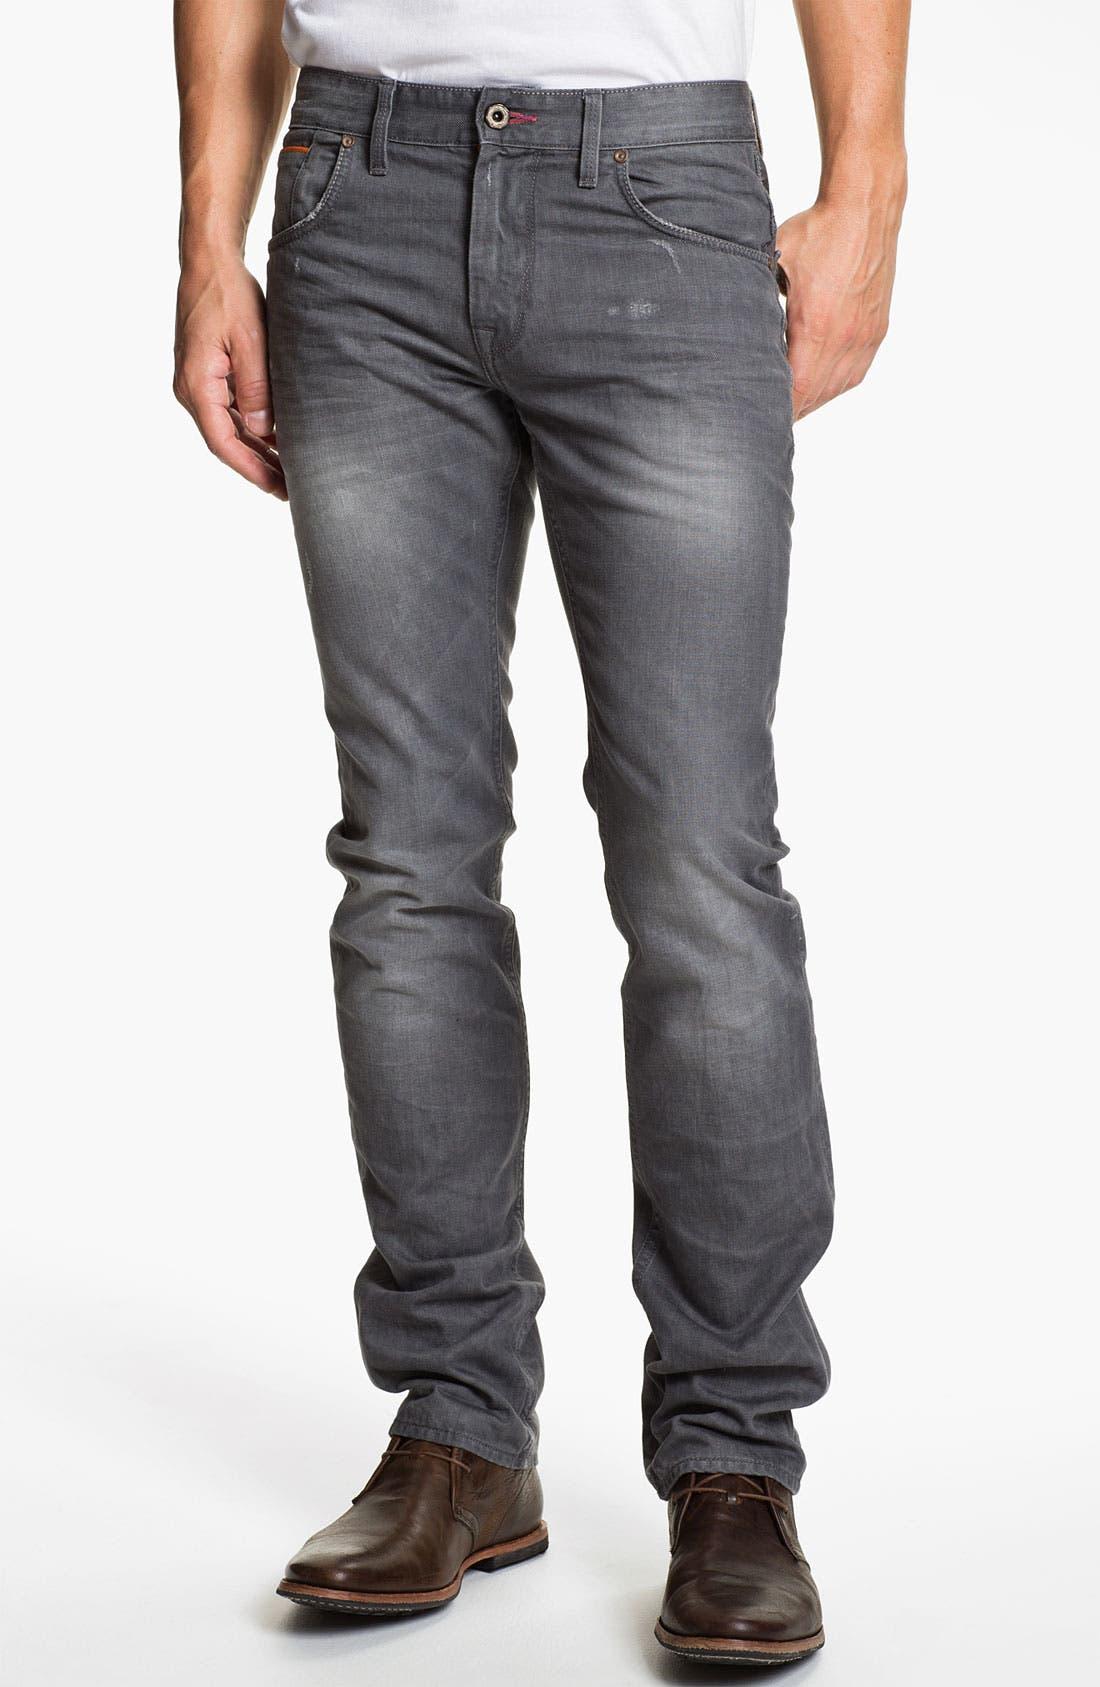 Alternate Image 1 Selected - Robert Graham Jeans 'Grey Day' Slim Straight Leg Jeans (Grey)